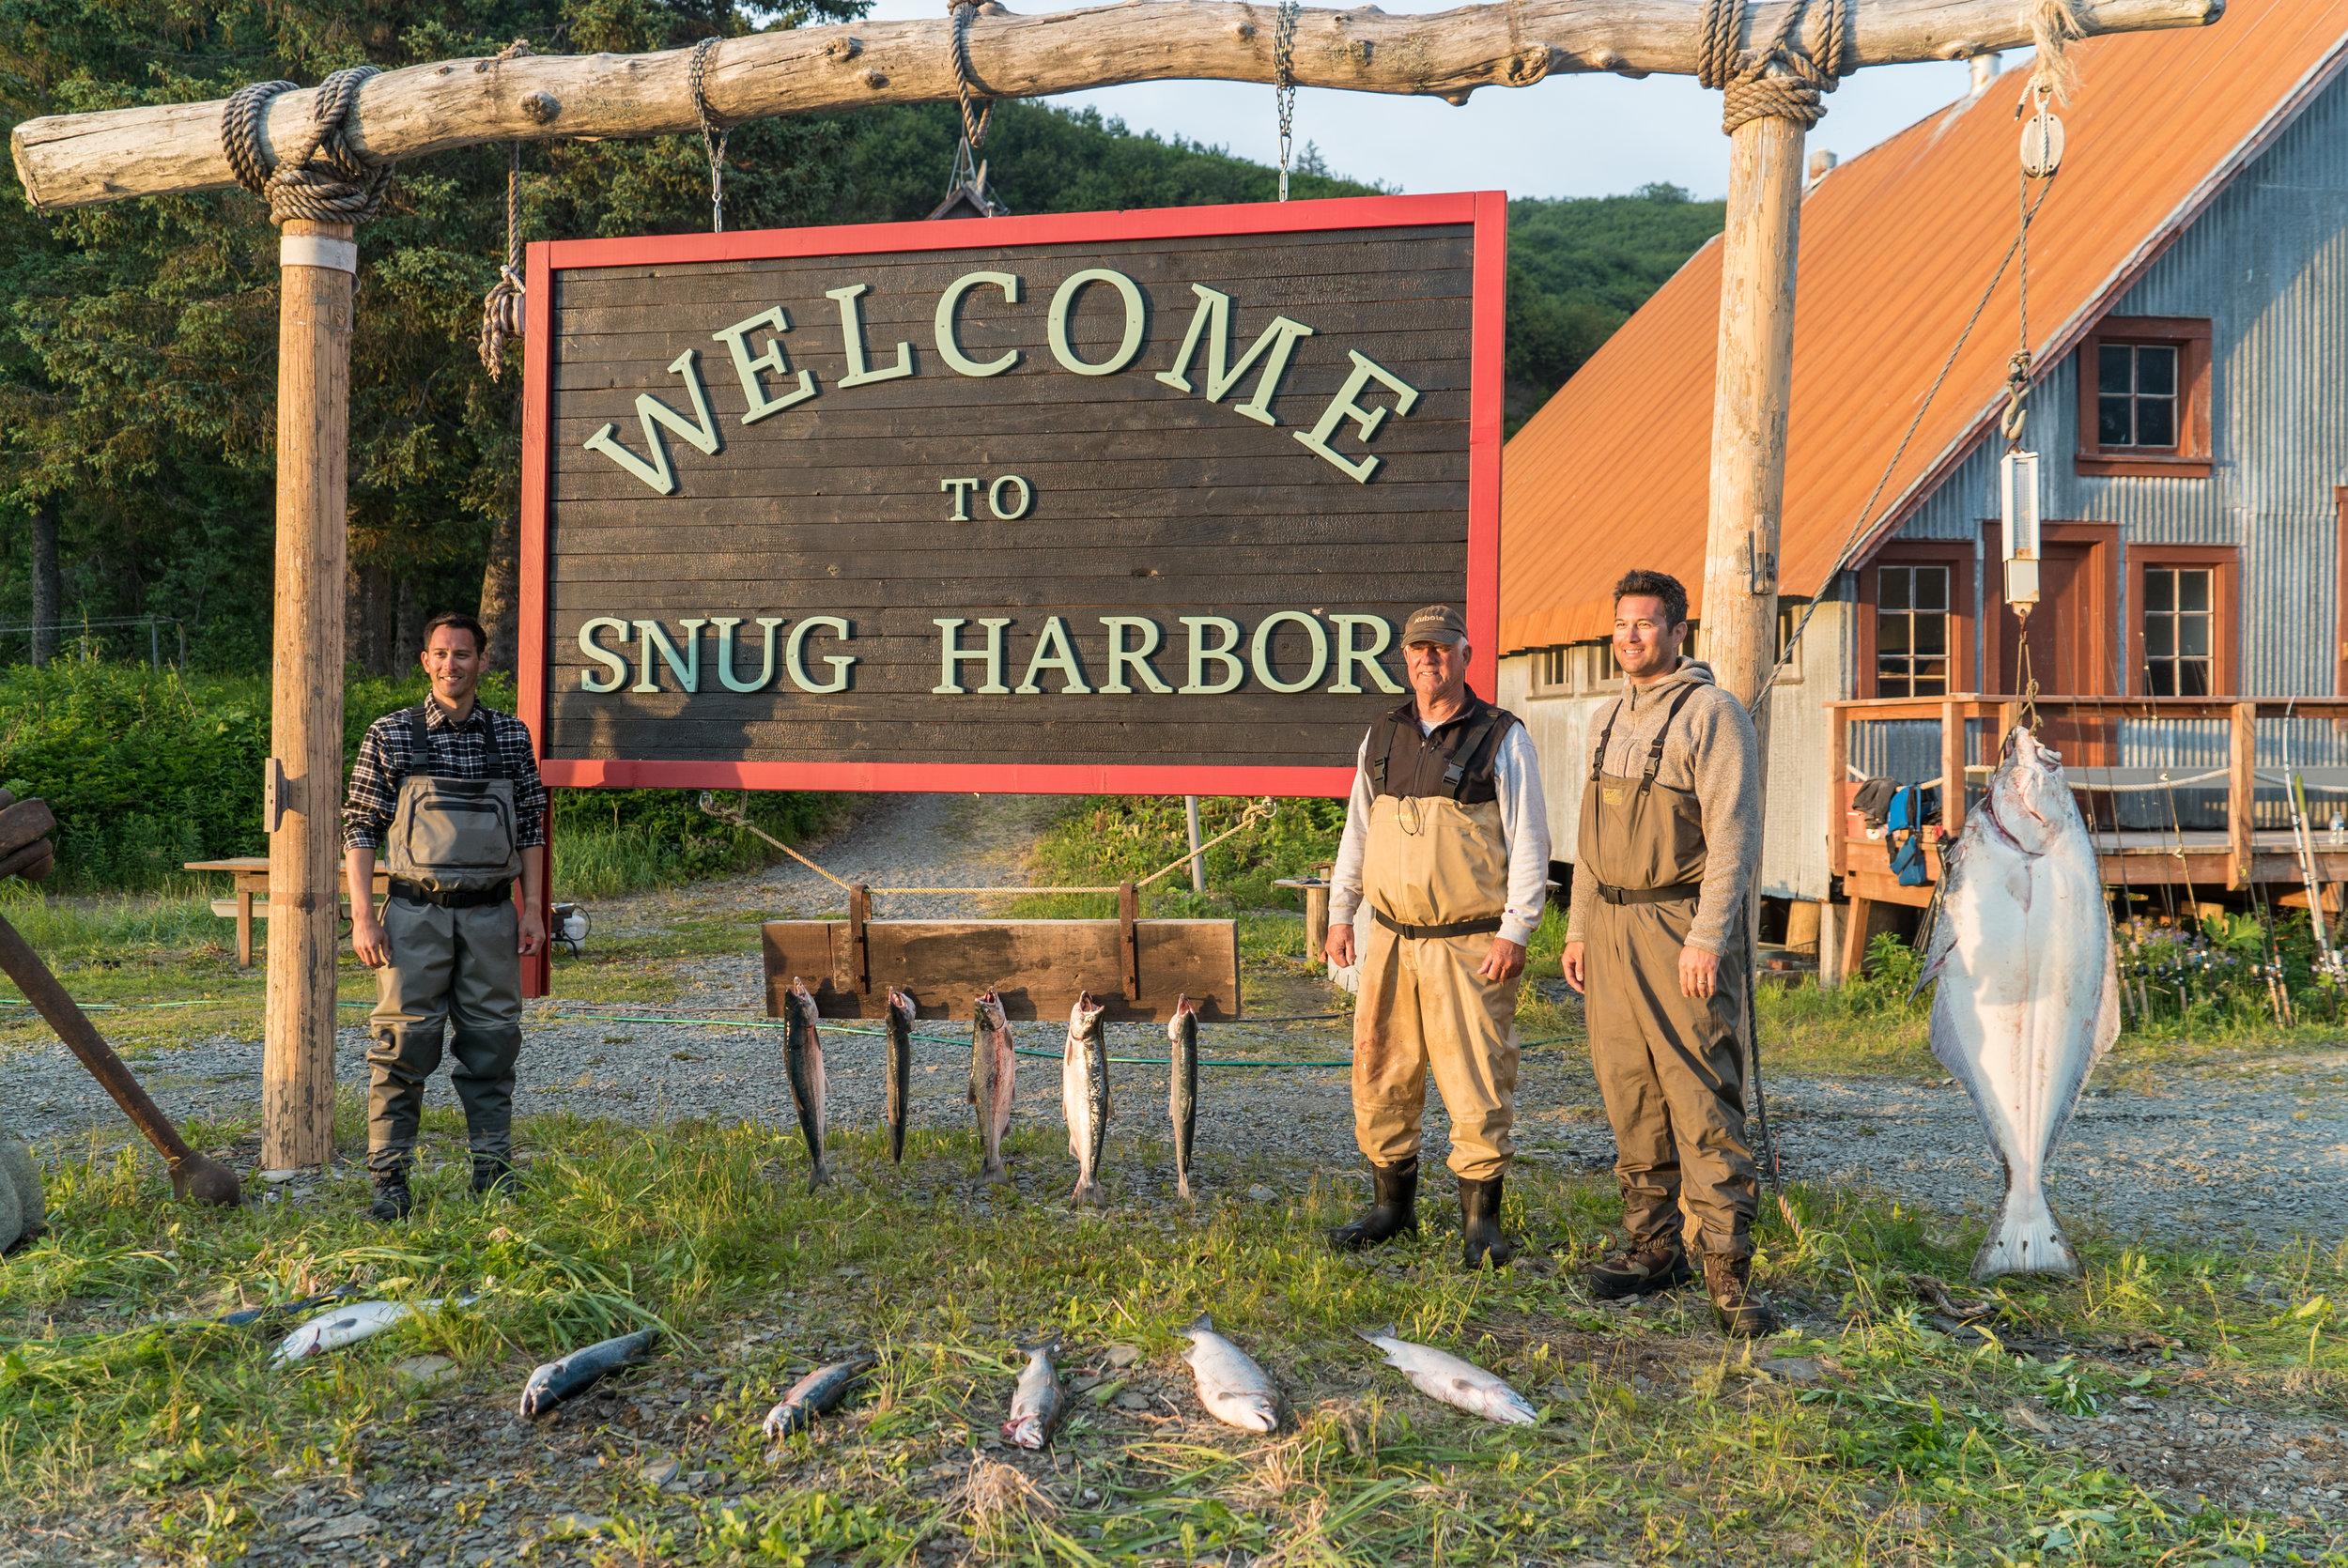 snug-harbor-alaska-Photo-by-Aaron-Minks-DSC06914.jpg